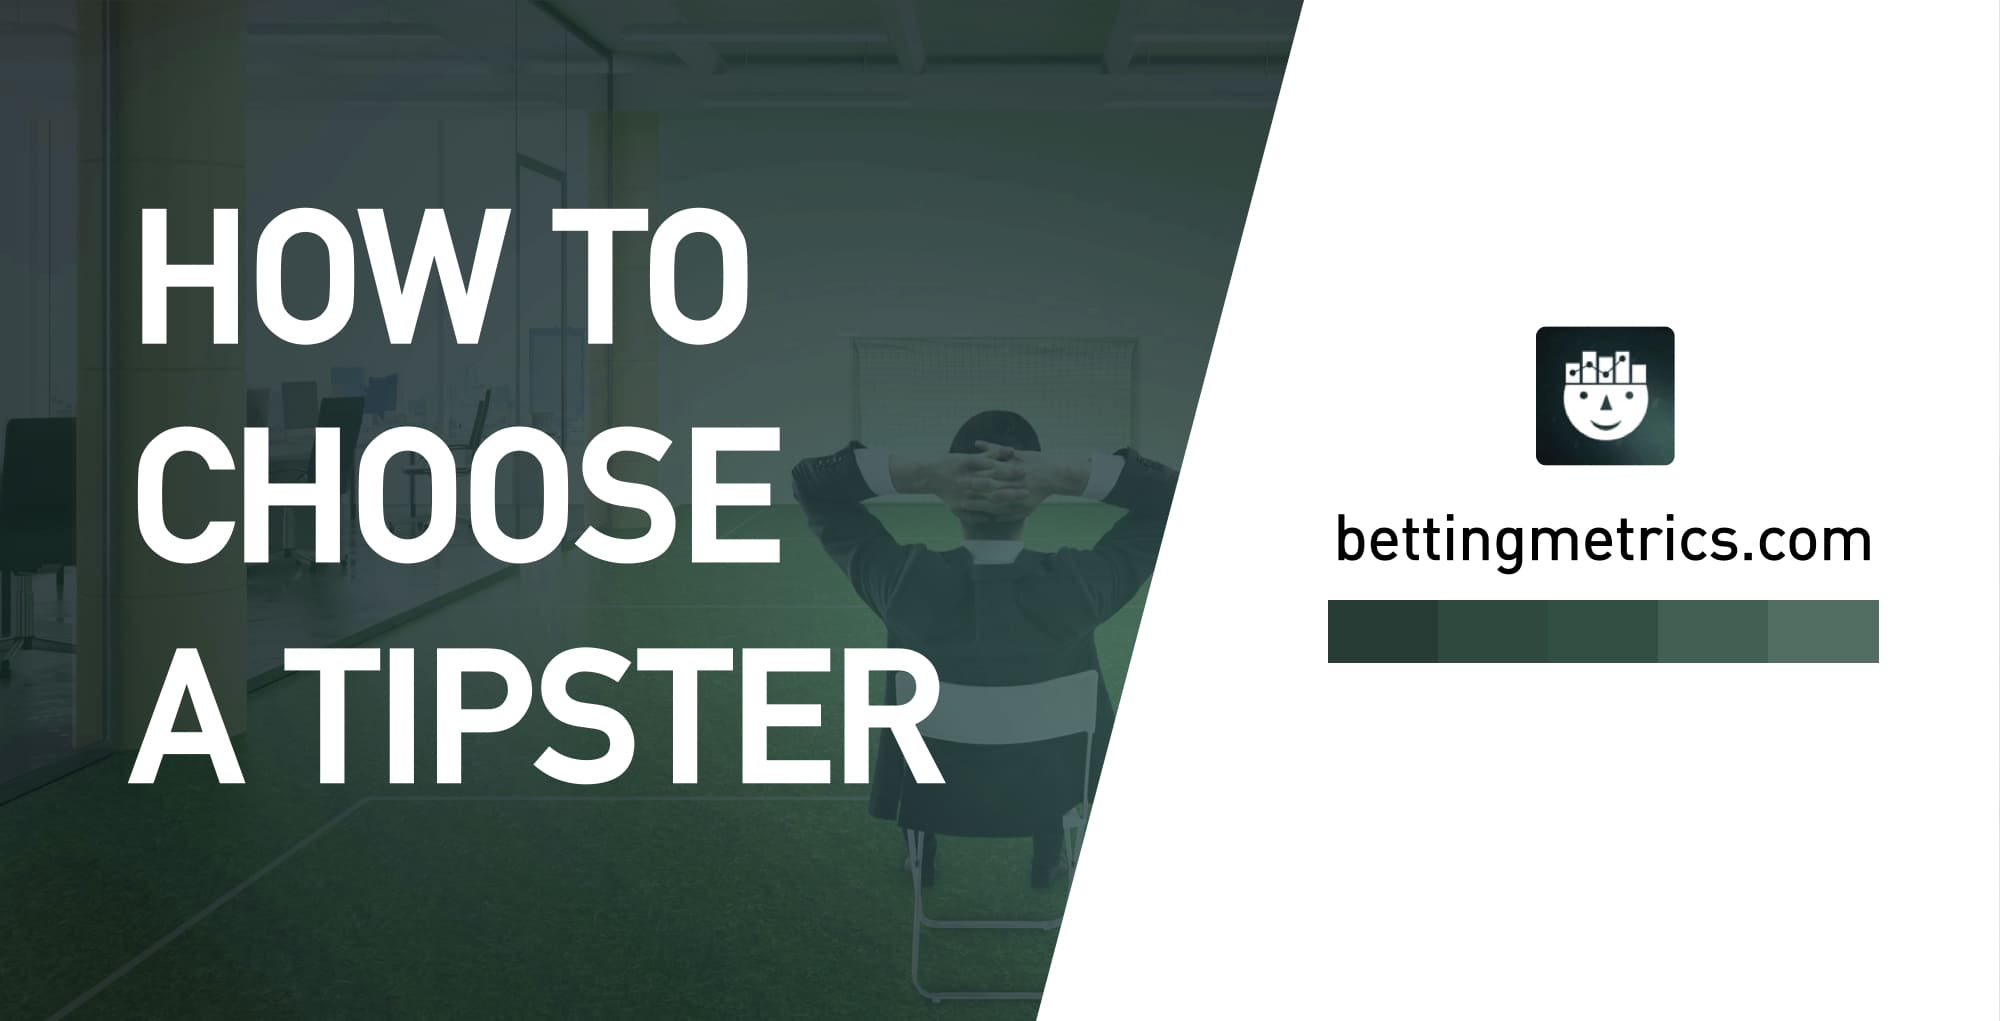 Bettingmetrics-bet-tracker-advice-how-to-choose-a-profitable-tipster